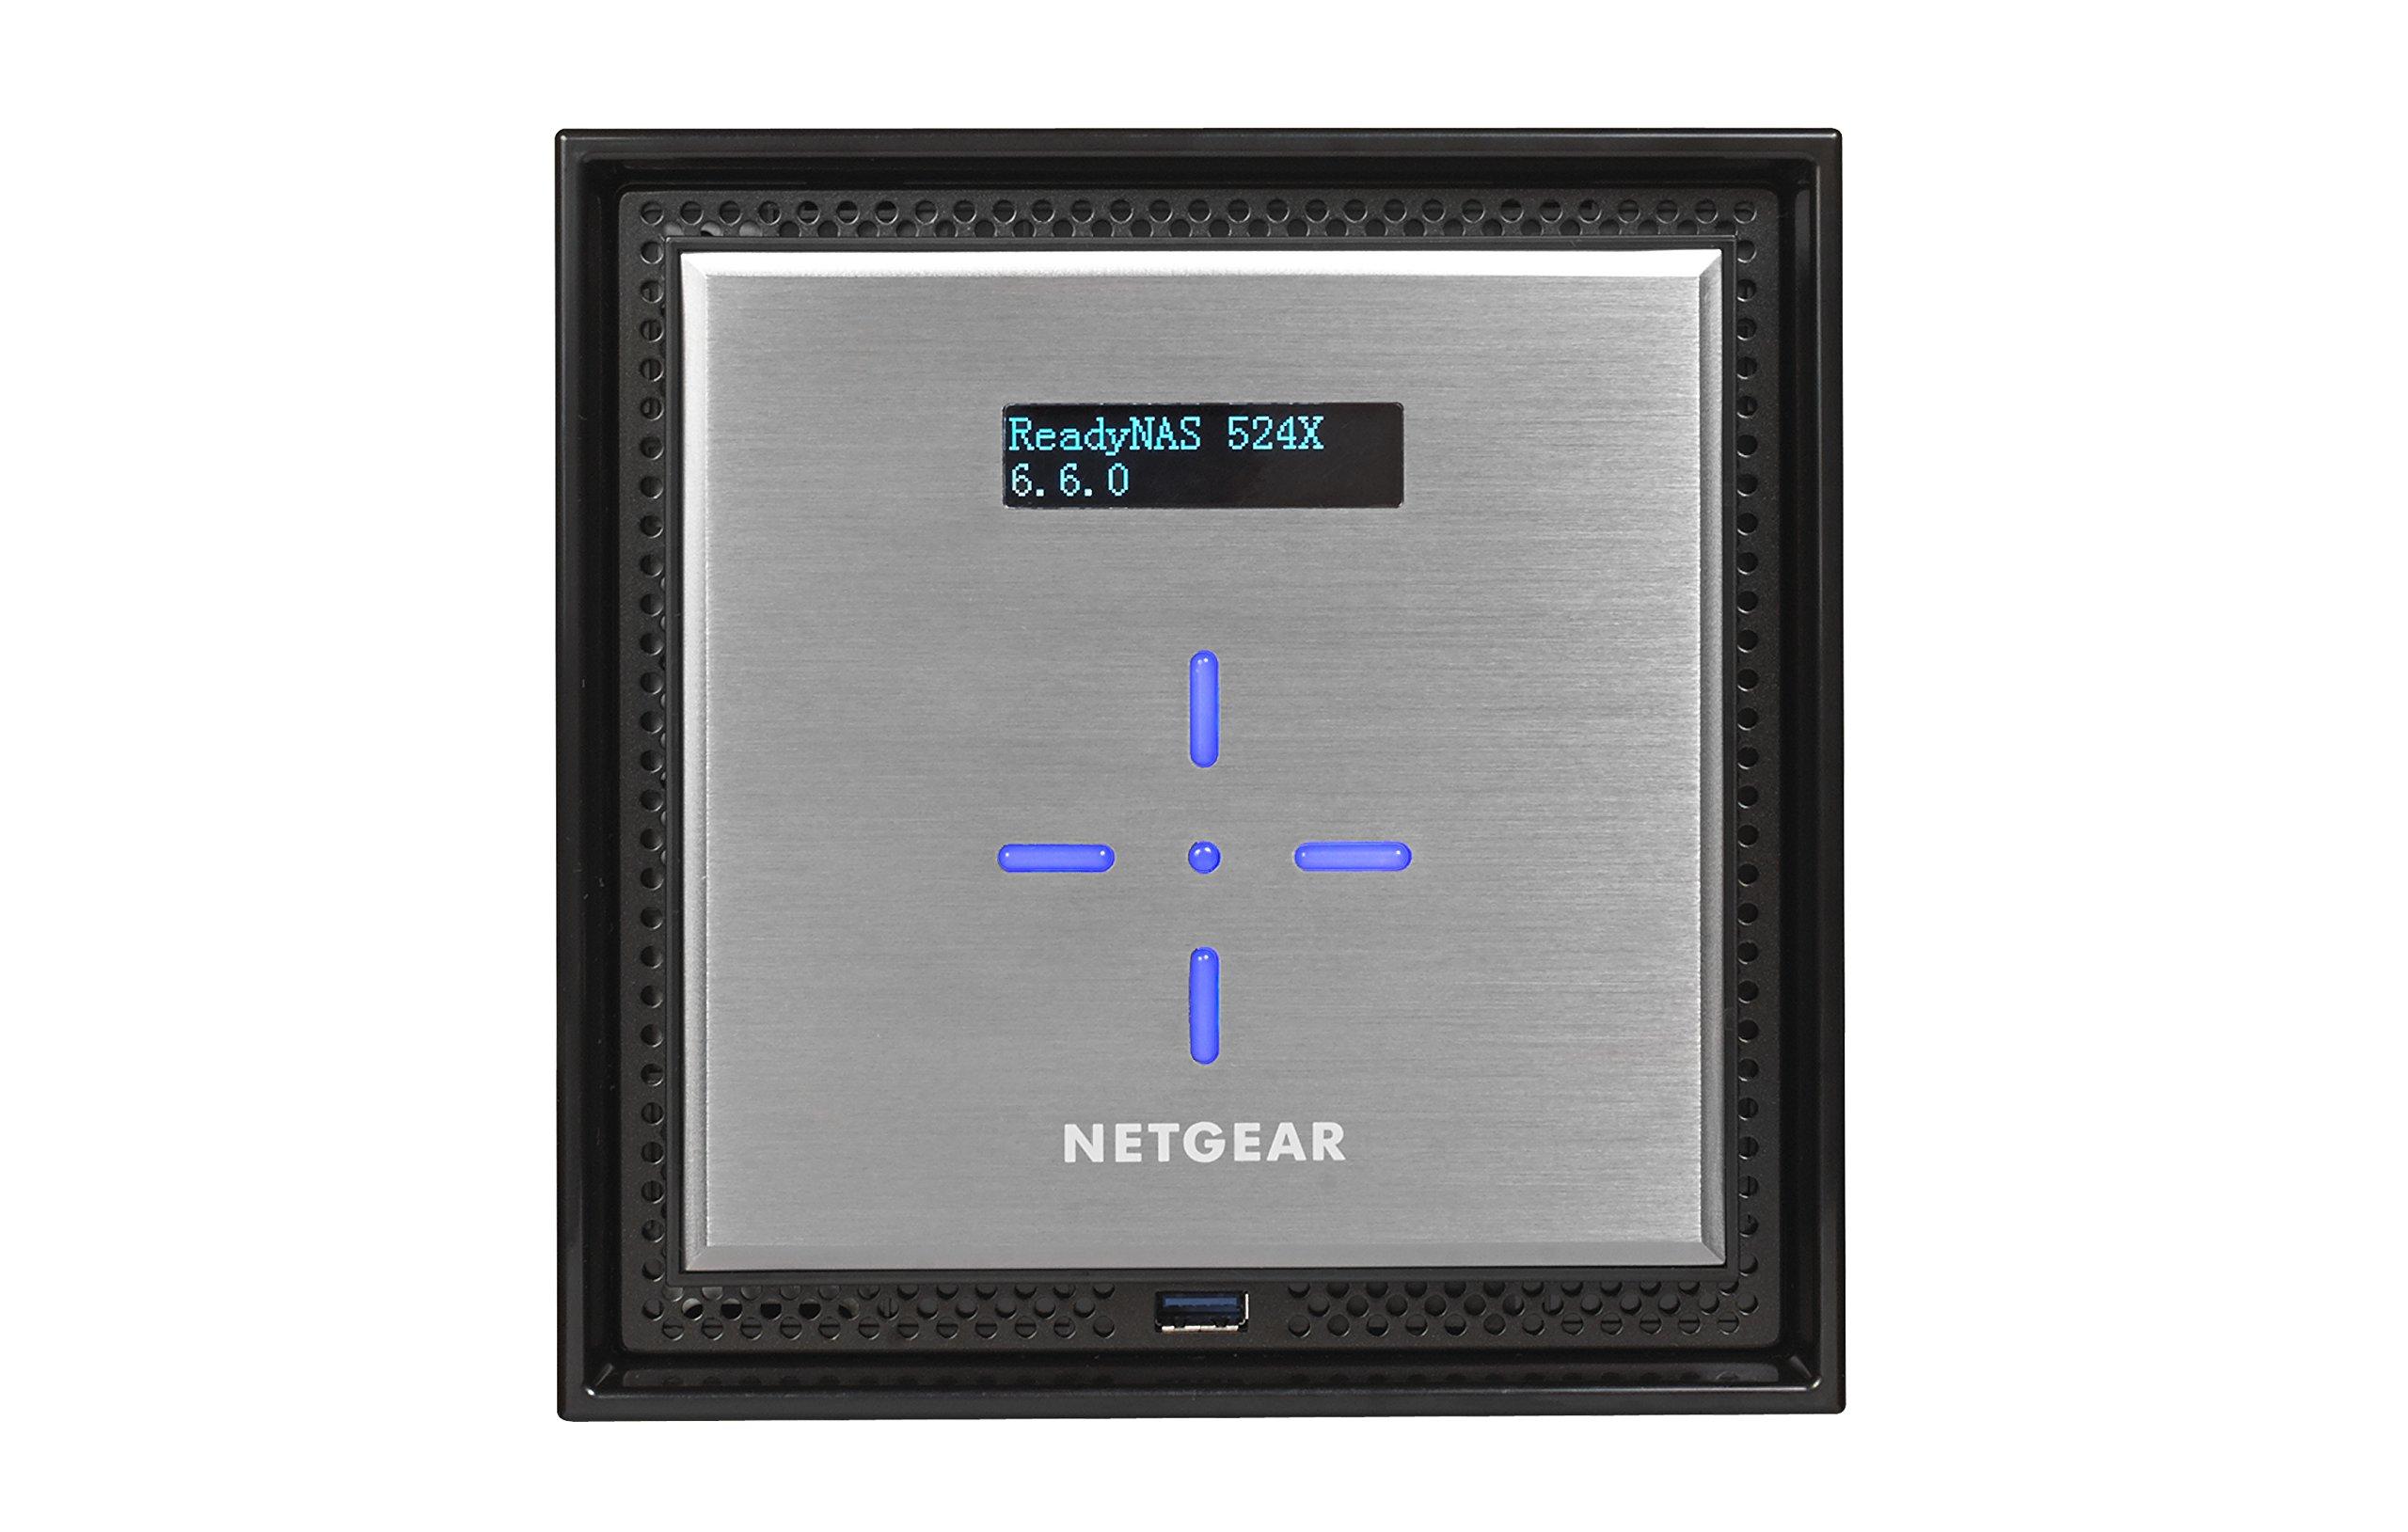 NETGEAR ReadyNAS RN524X00 4 Bay Diskless Premium Performance NAS, 40TB Capacity Network Attached Storage, Intel 2.2GHz Dual Core Processor, 4GB RAM by NETGEAR